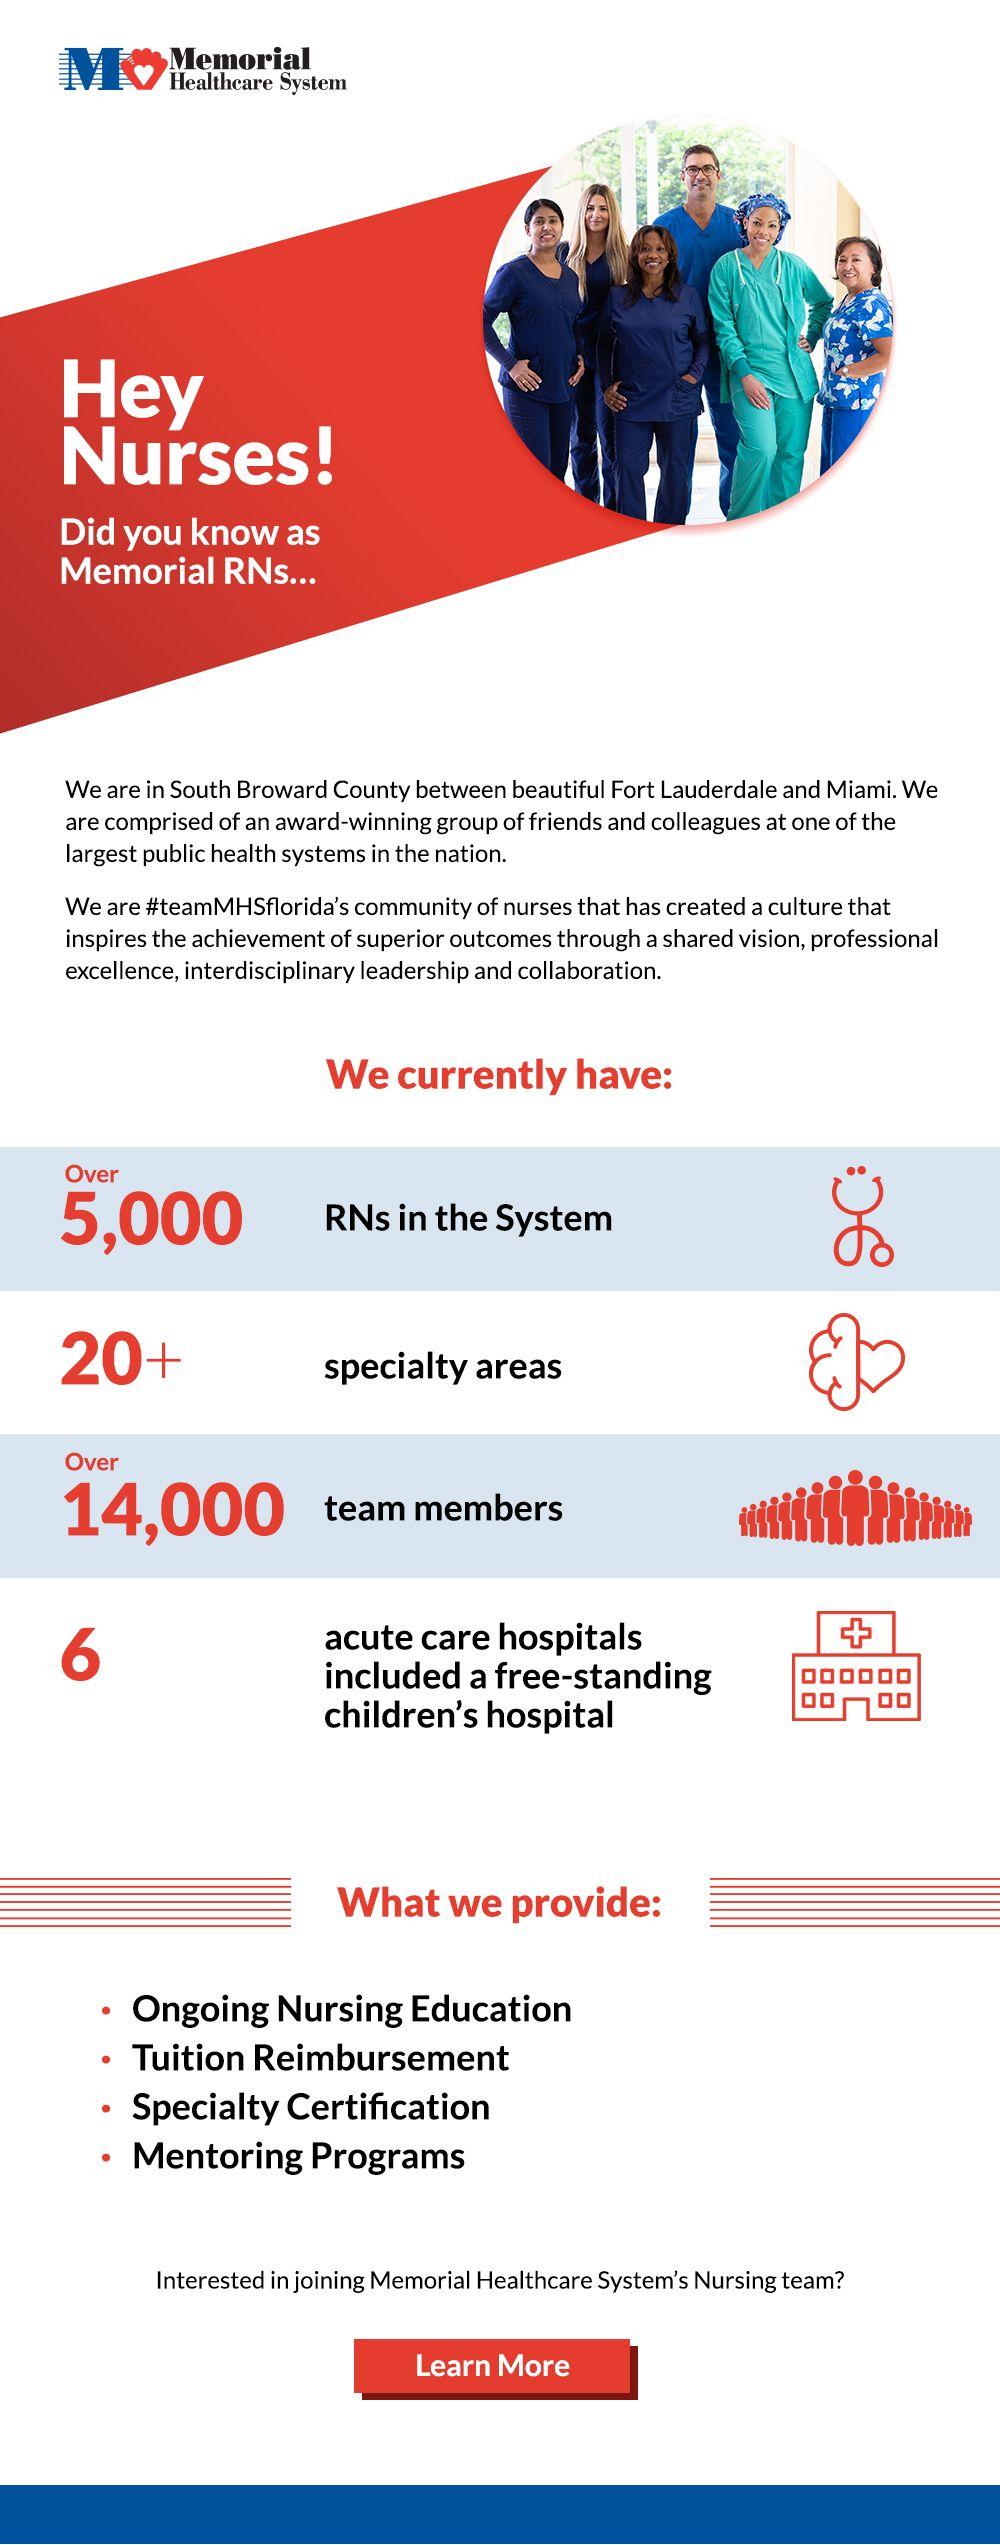 Nursing Jobs at Memorial Healthcare System in 2020